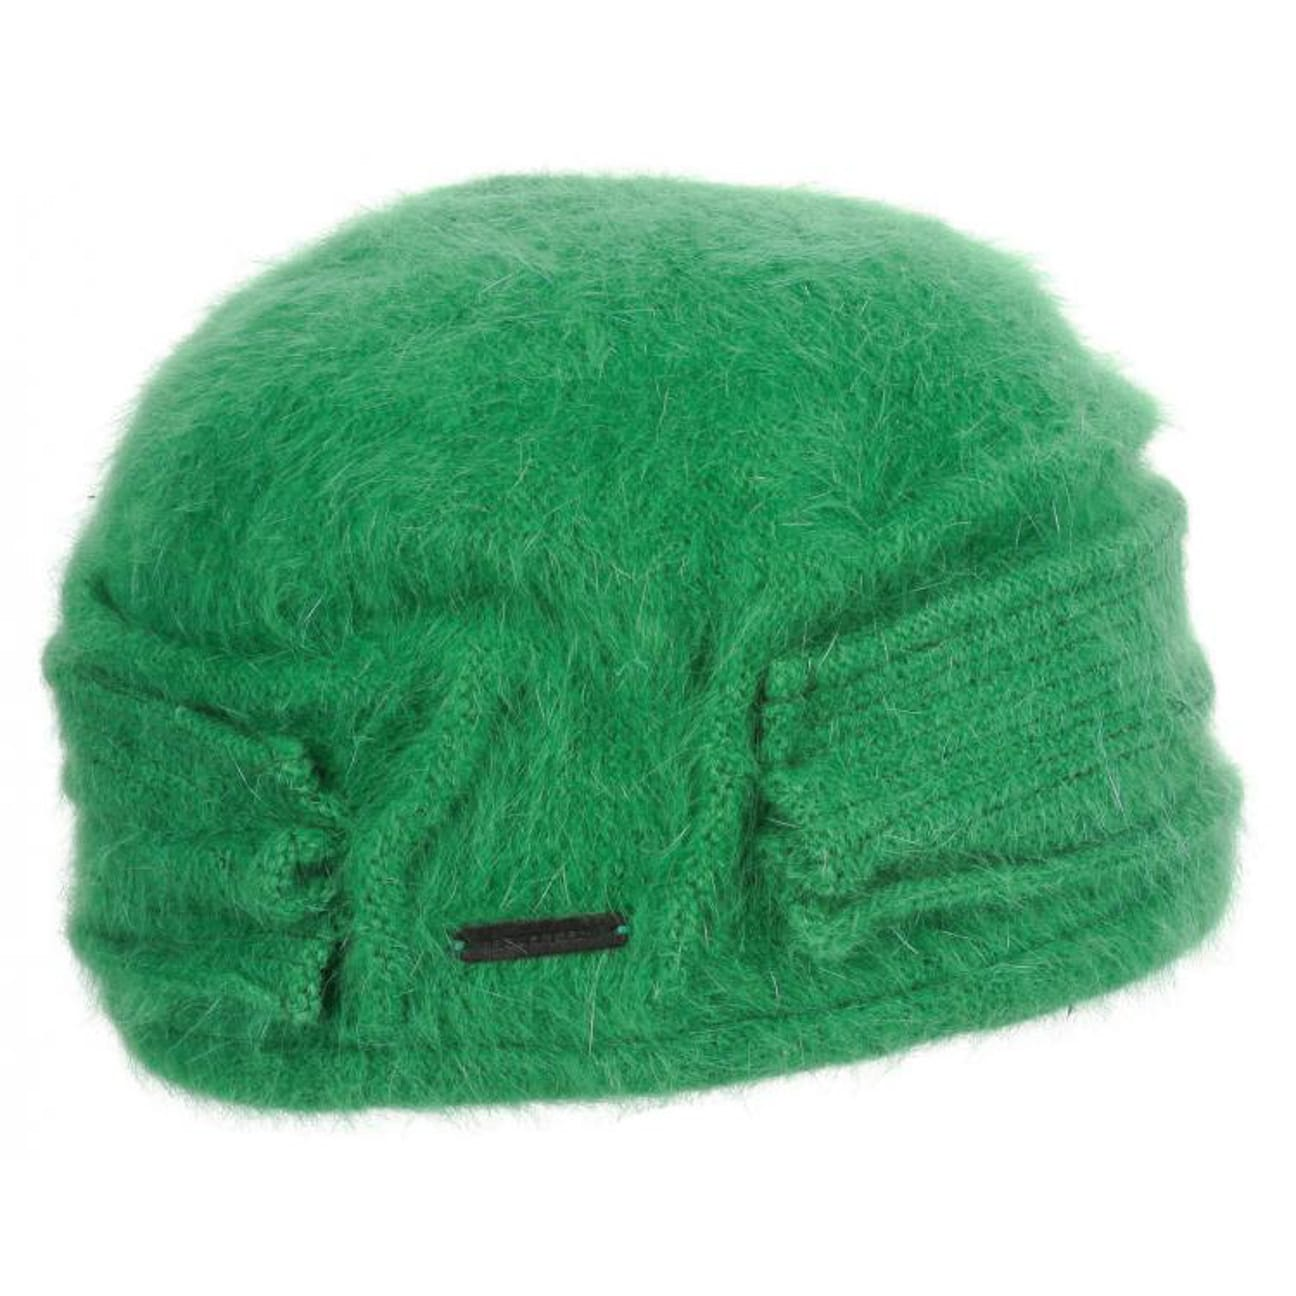 e90744846db ... Nakiska Angora Toque Hat by Seeberger - green 1 ...